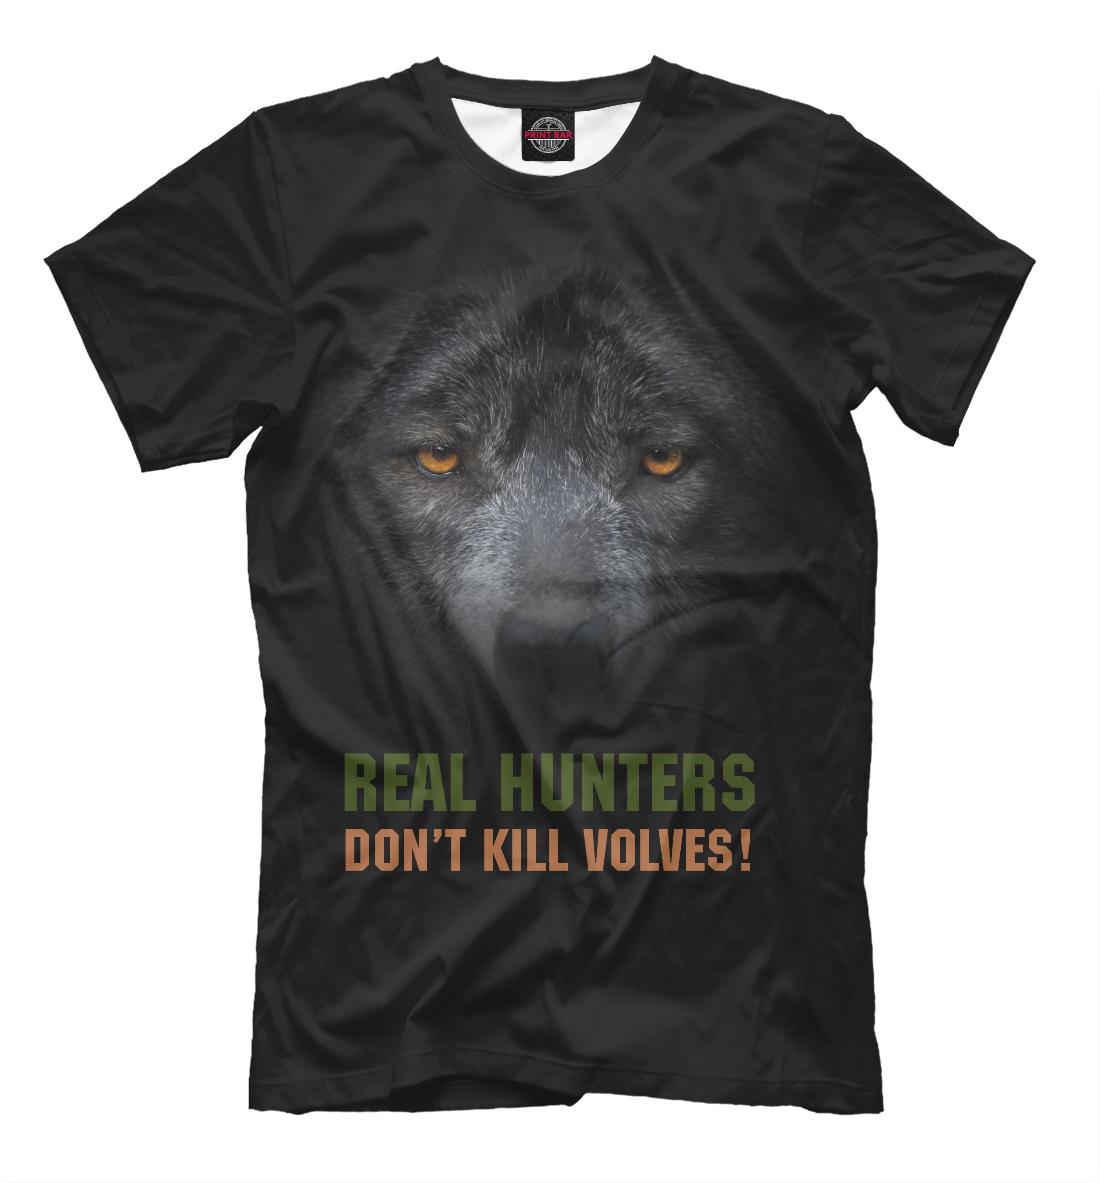 Купить Real hunters don't kill volves!, Printbar, Футболки, VLF-955850-fut-2